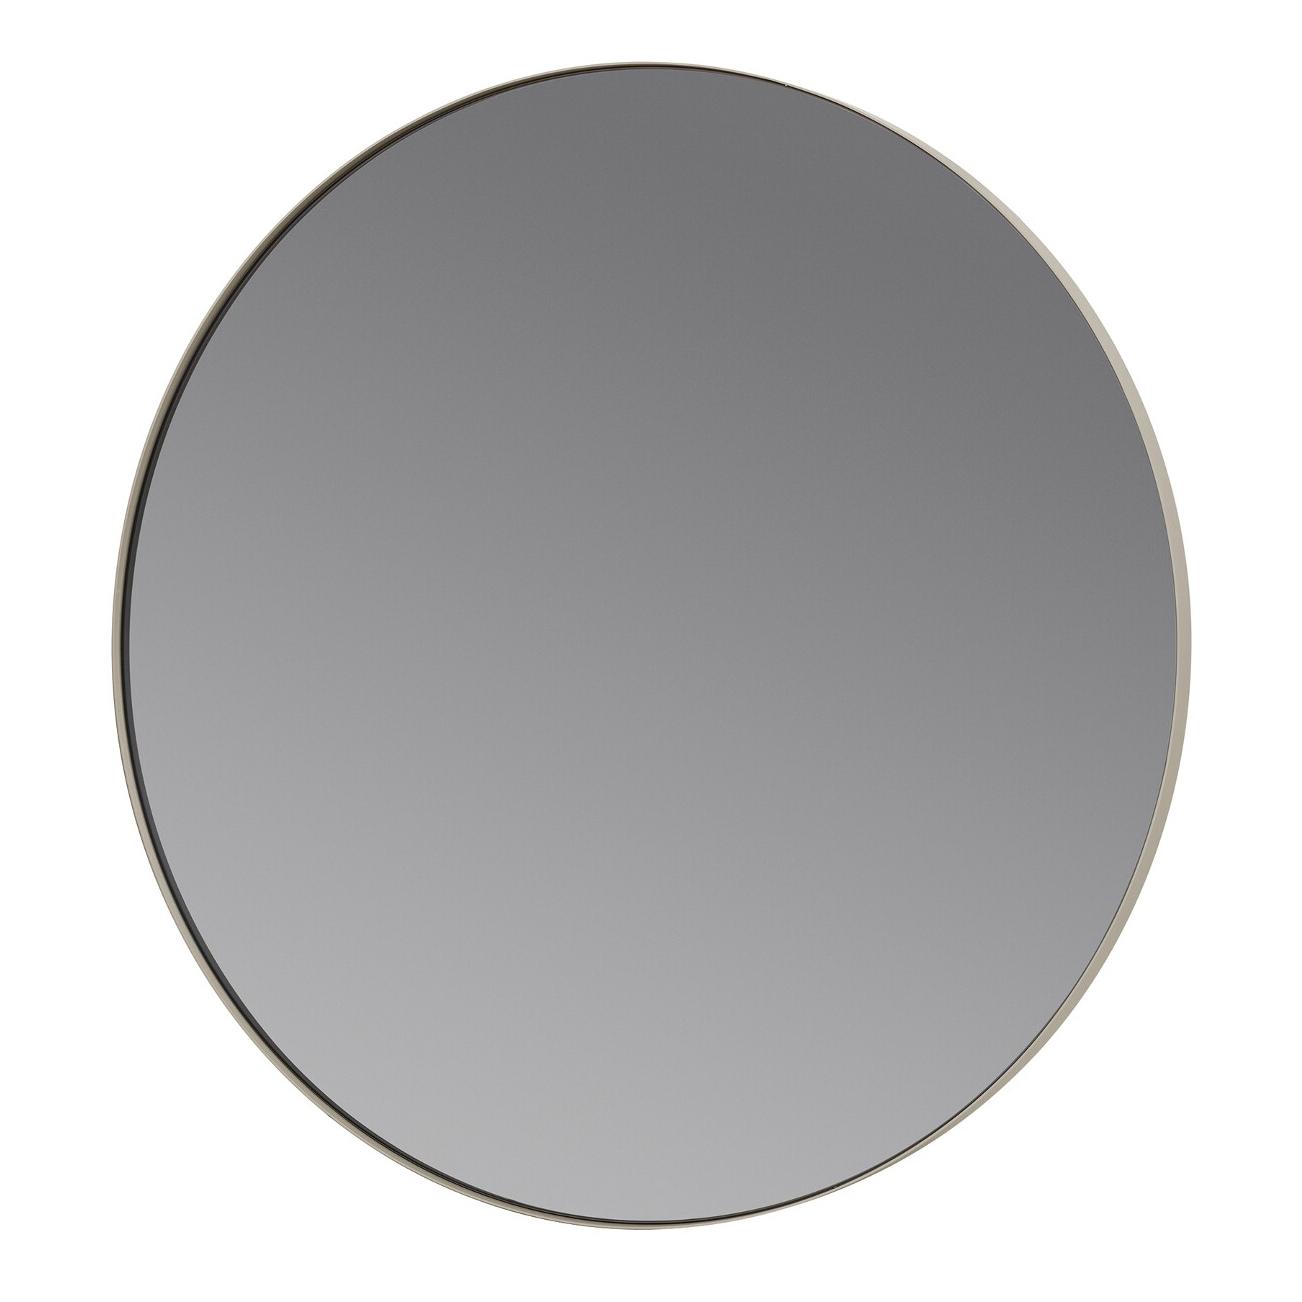 Okrúhle zrkadlo RIM sivé Blomus